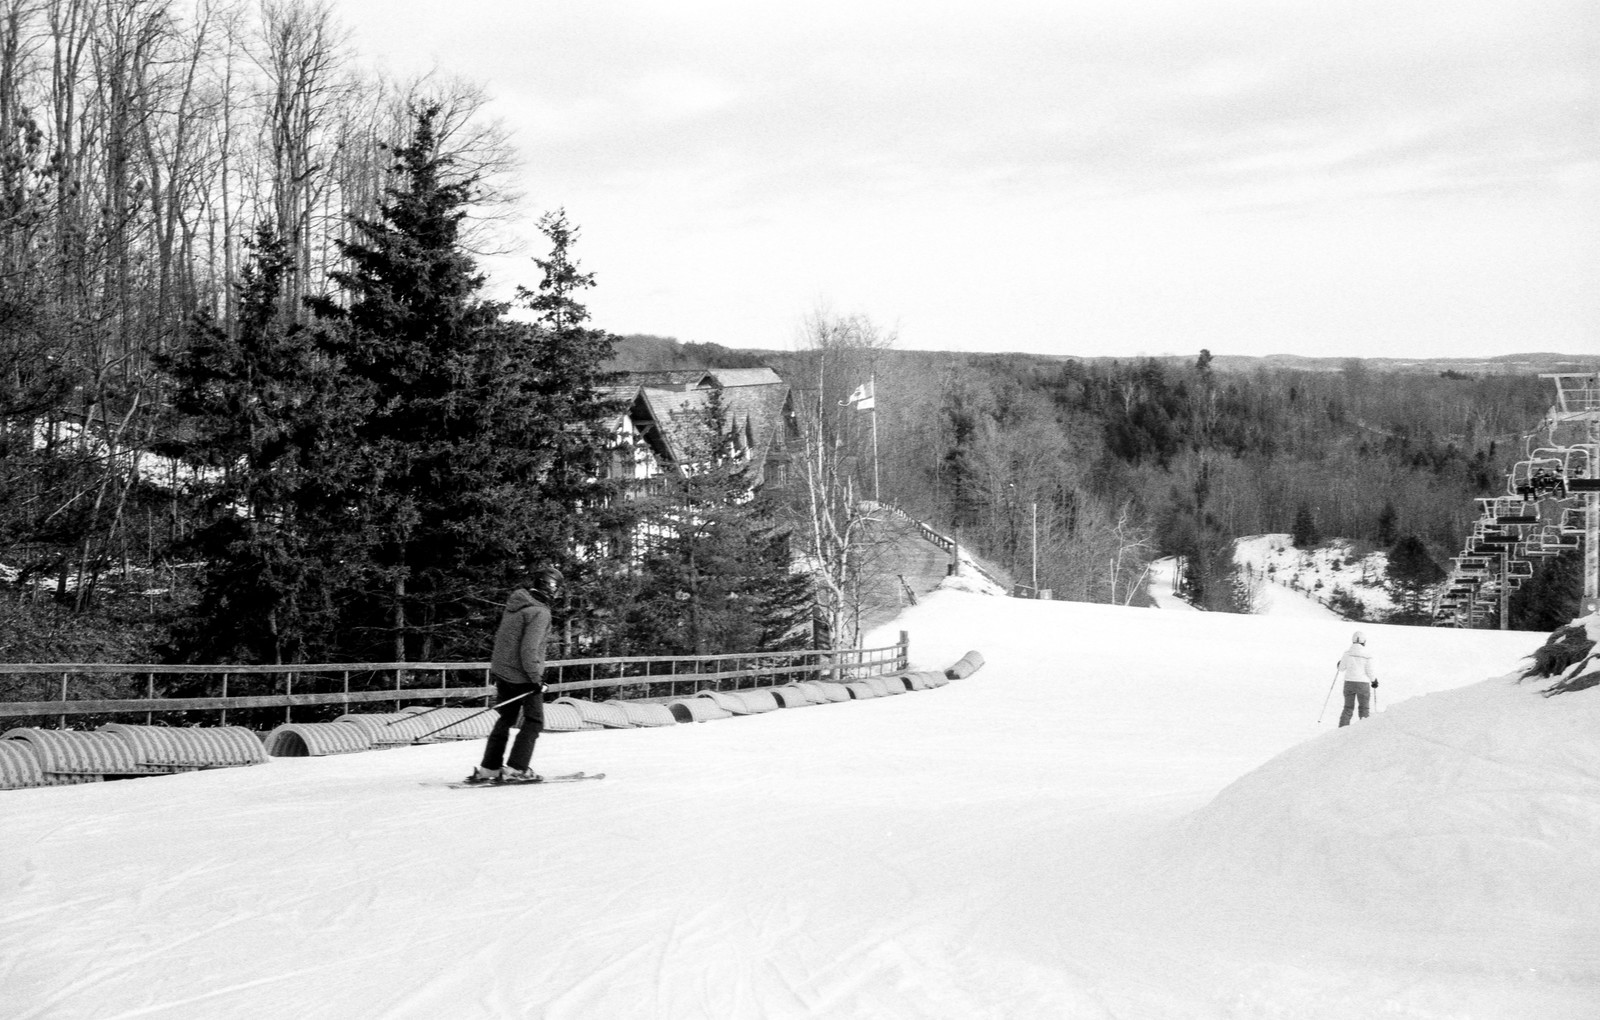 Skiing Down Eaton's Annex Feb 2020